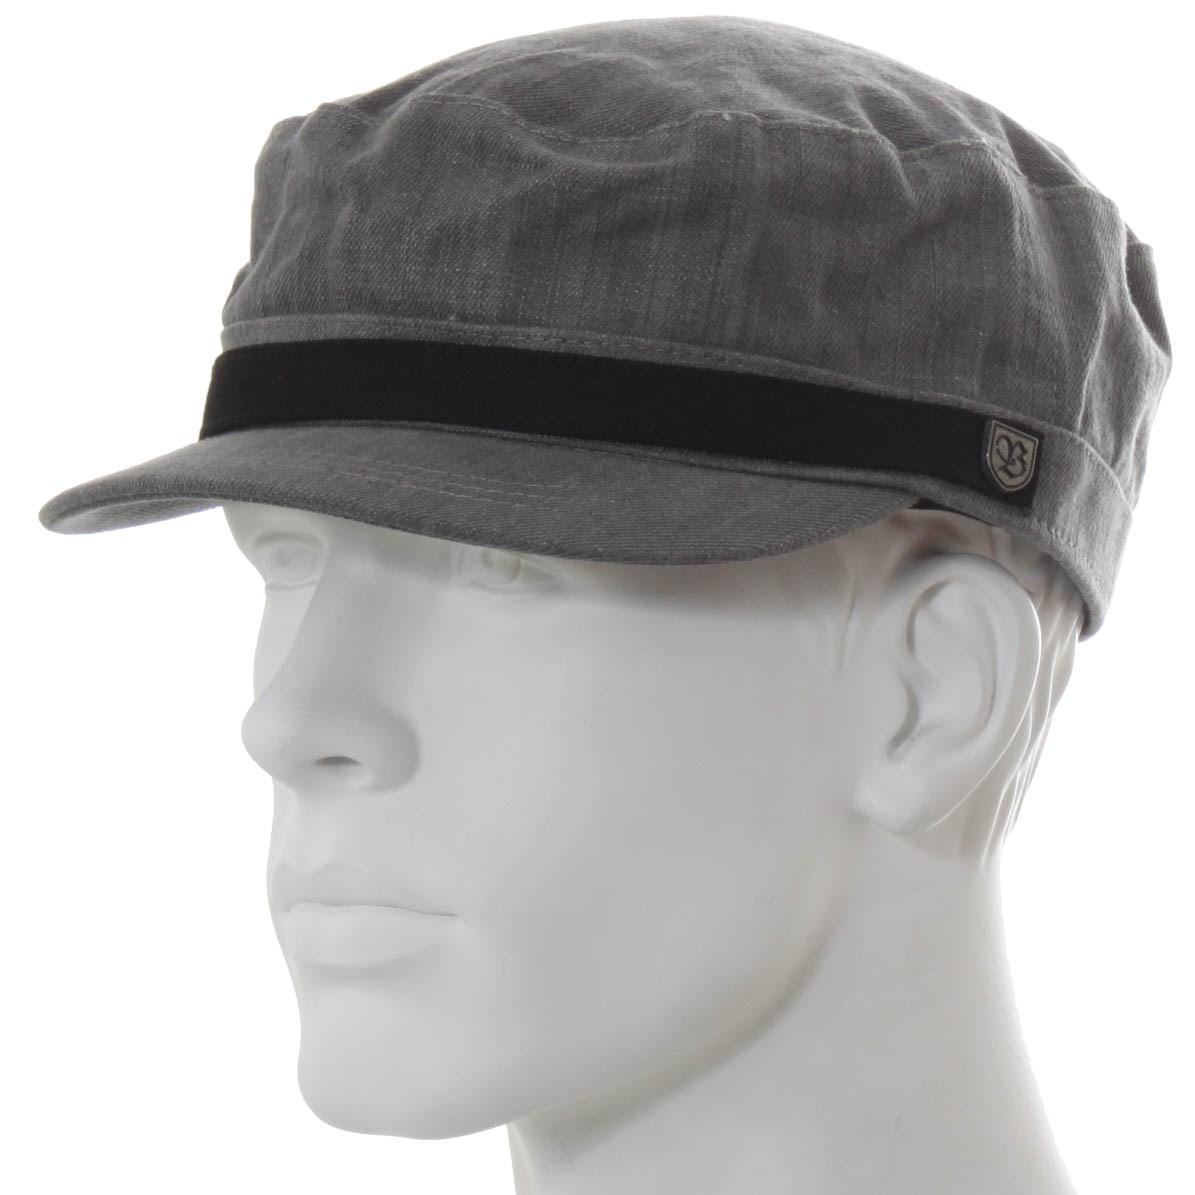 d49bd77a24691 australia brixton hat in military green 4ff65 73507  sweden brixton busker  hat evo d4eea 8fca0